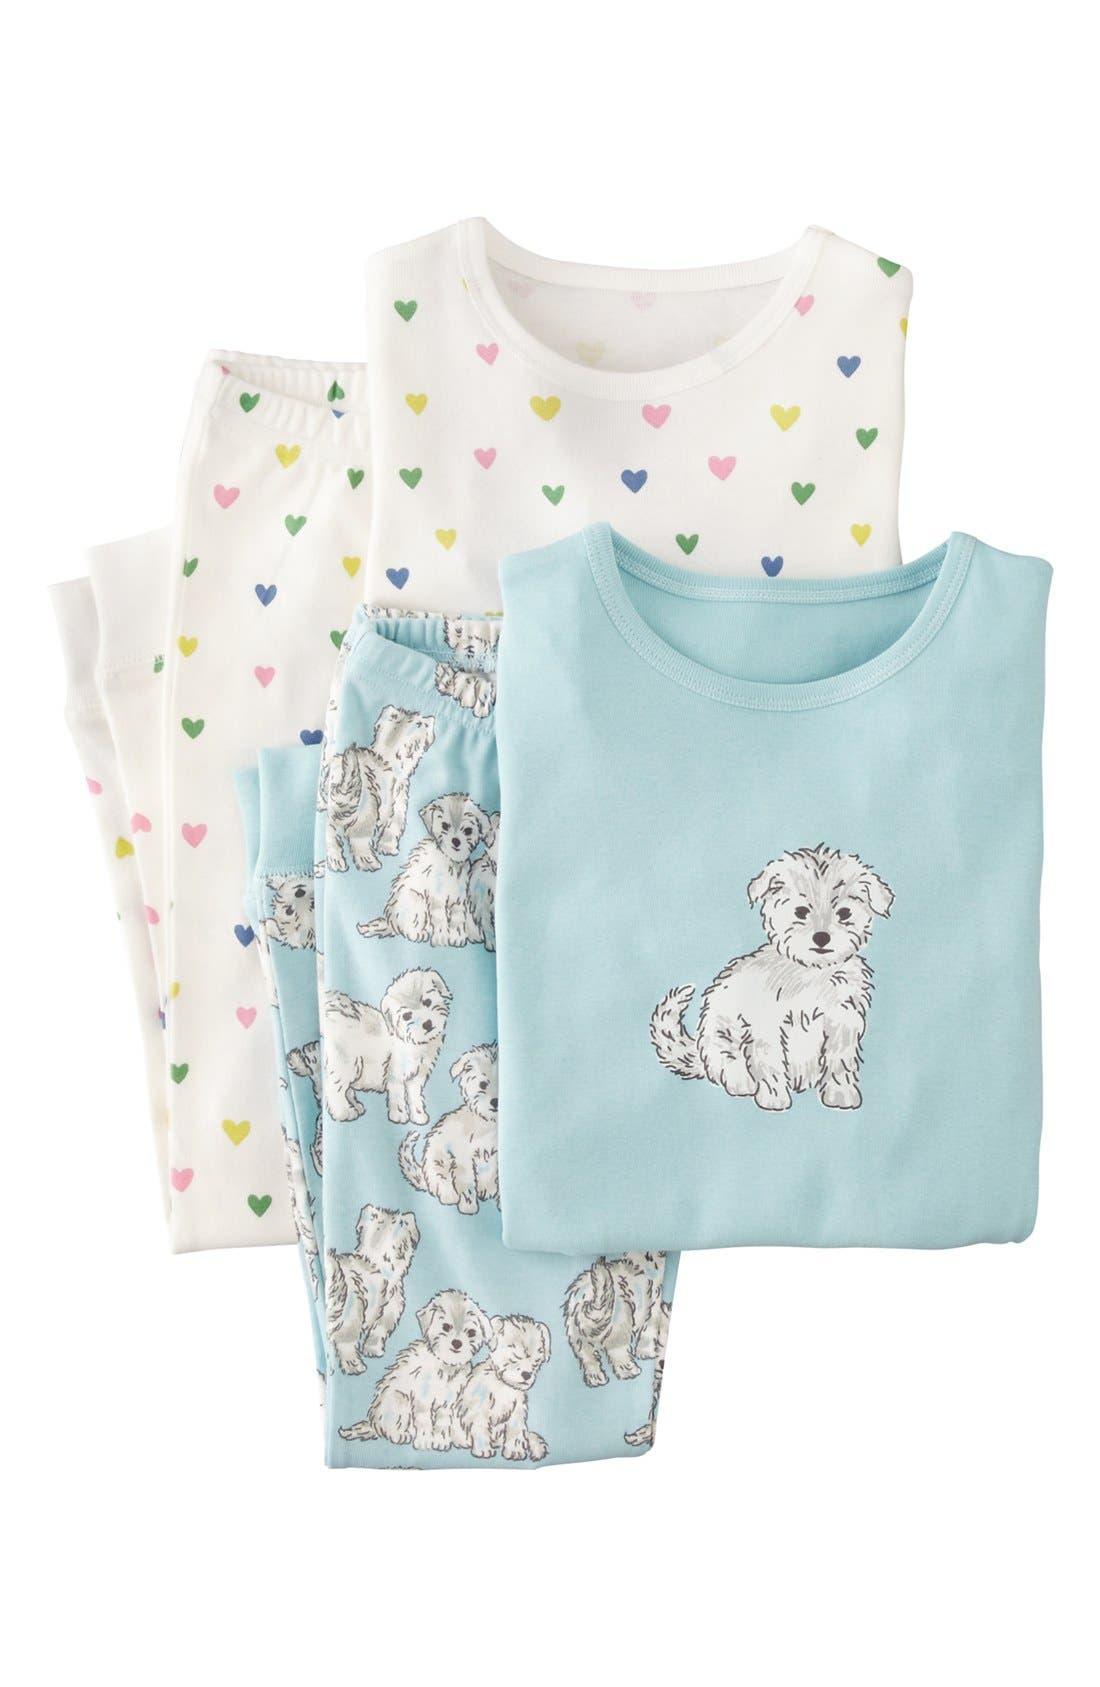 Main Image - Mini Boden Snug Fitting Pajamas (2-Pack) (Toddler Girls, Little Girls & Big Girls)